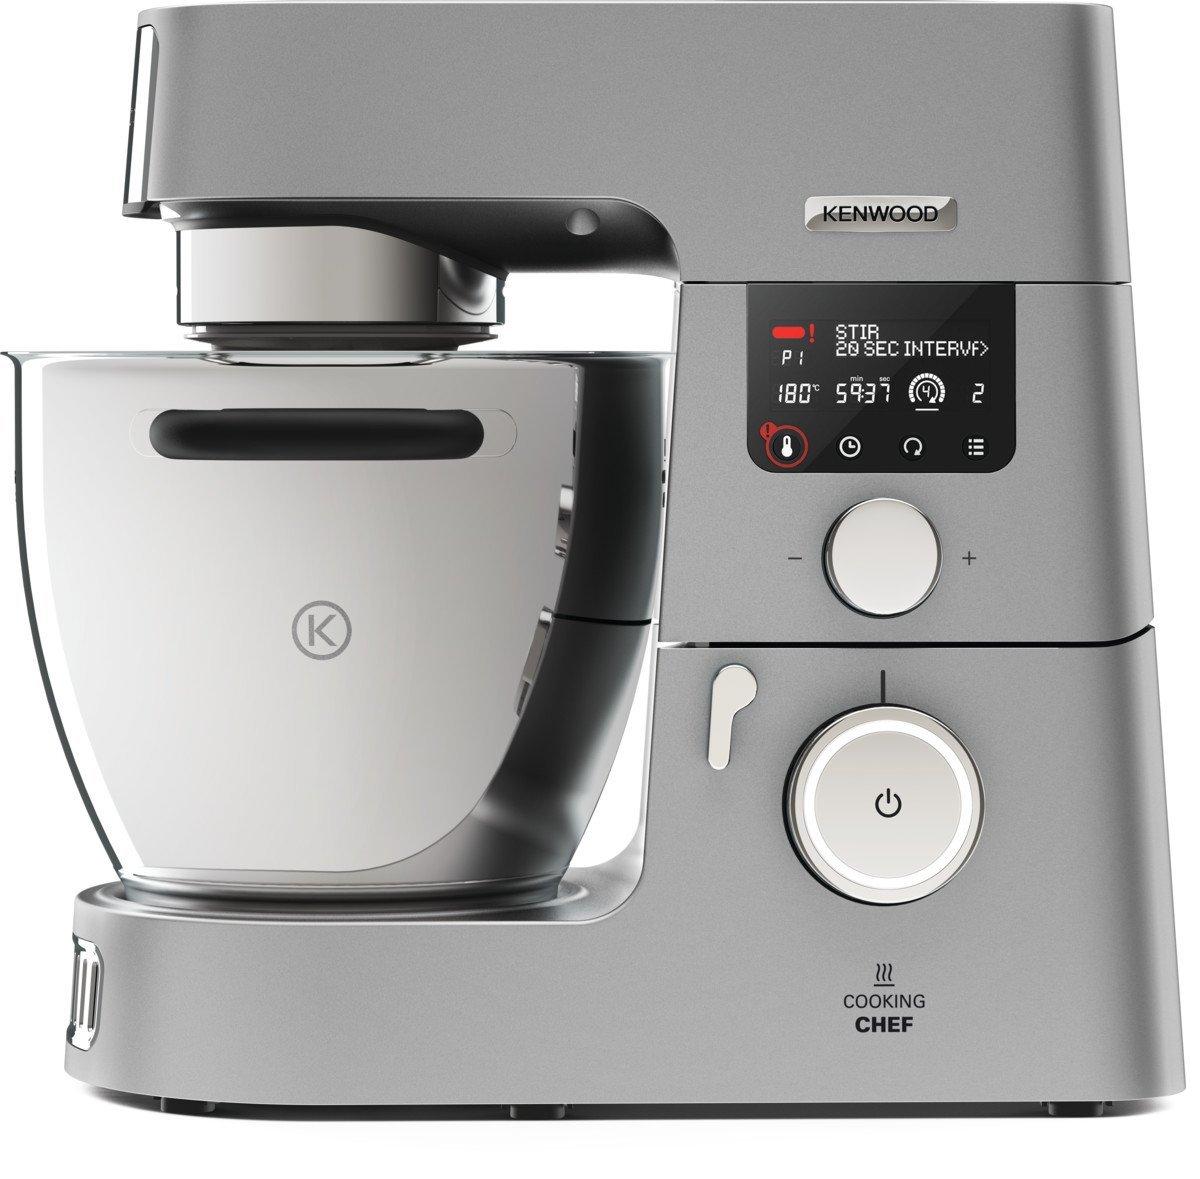 [Amazon.it] Kenwood Cooking Chef Gourmet KCC9040S